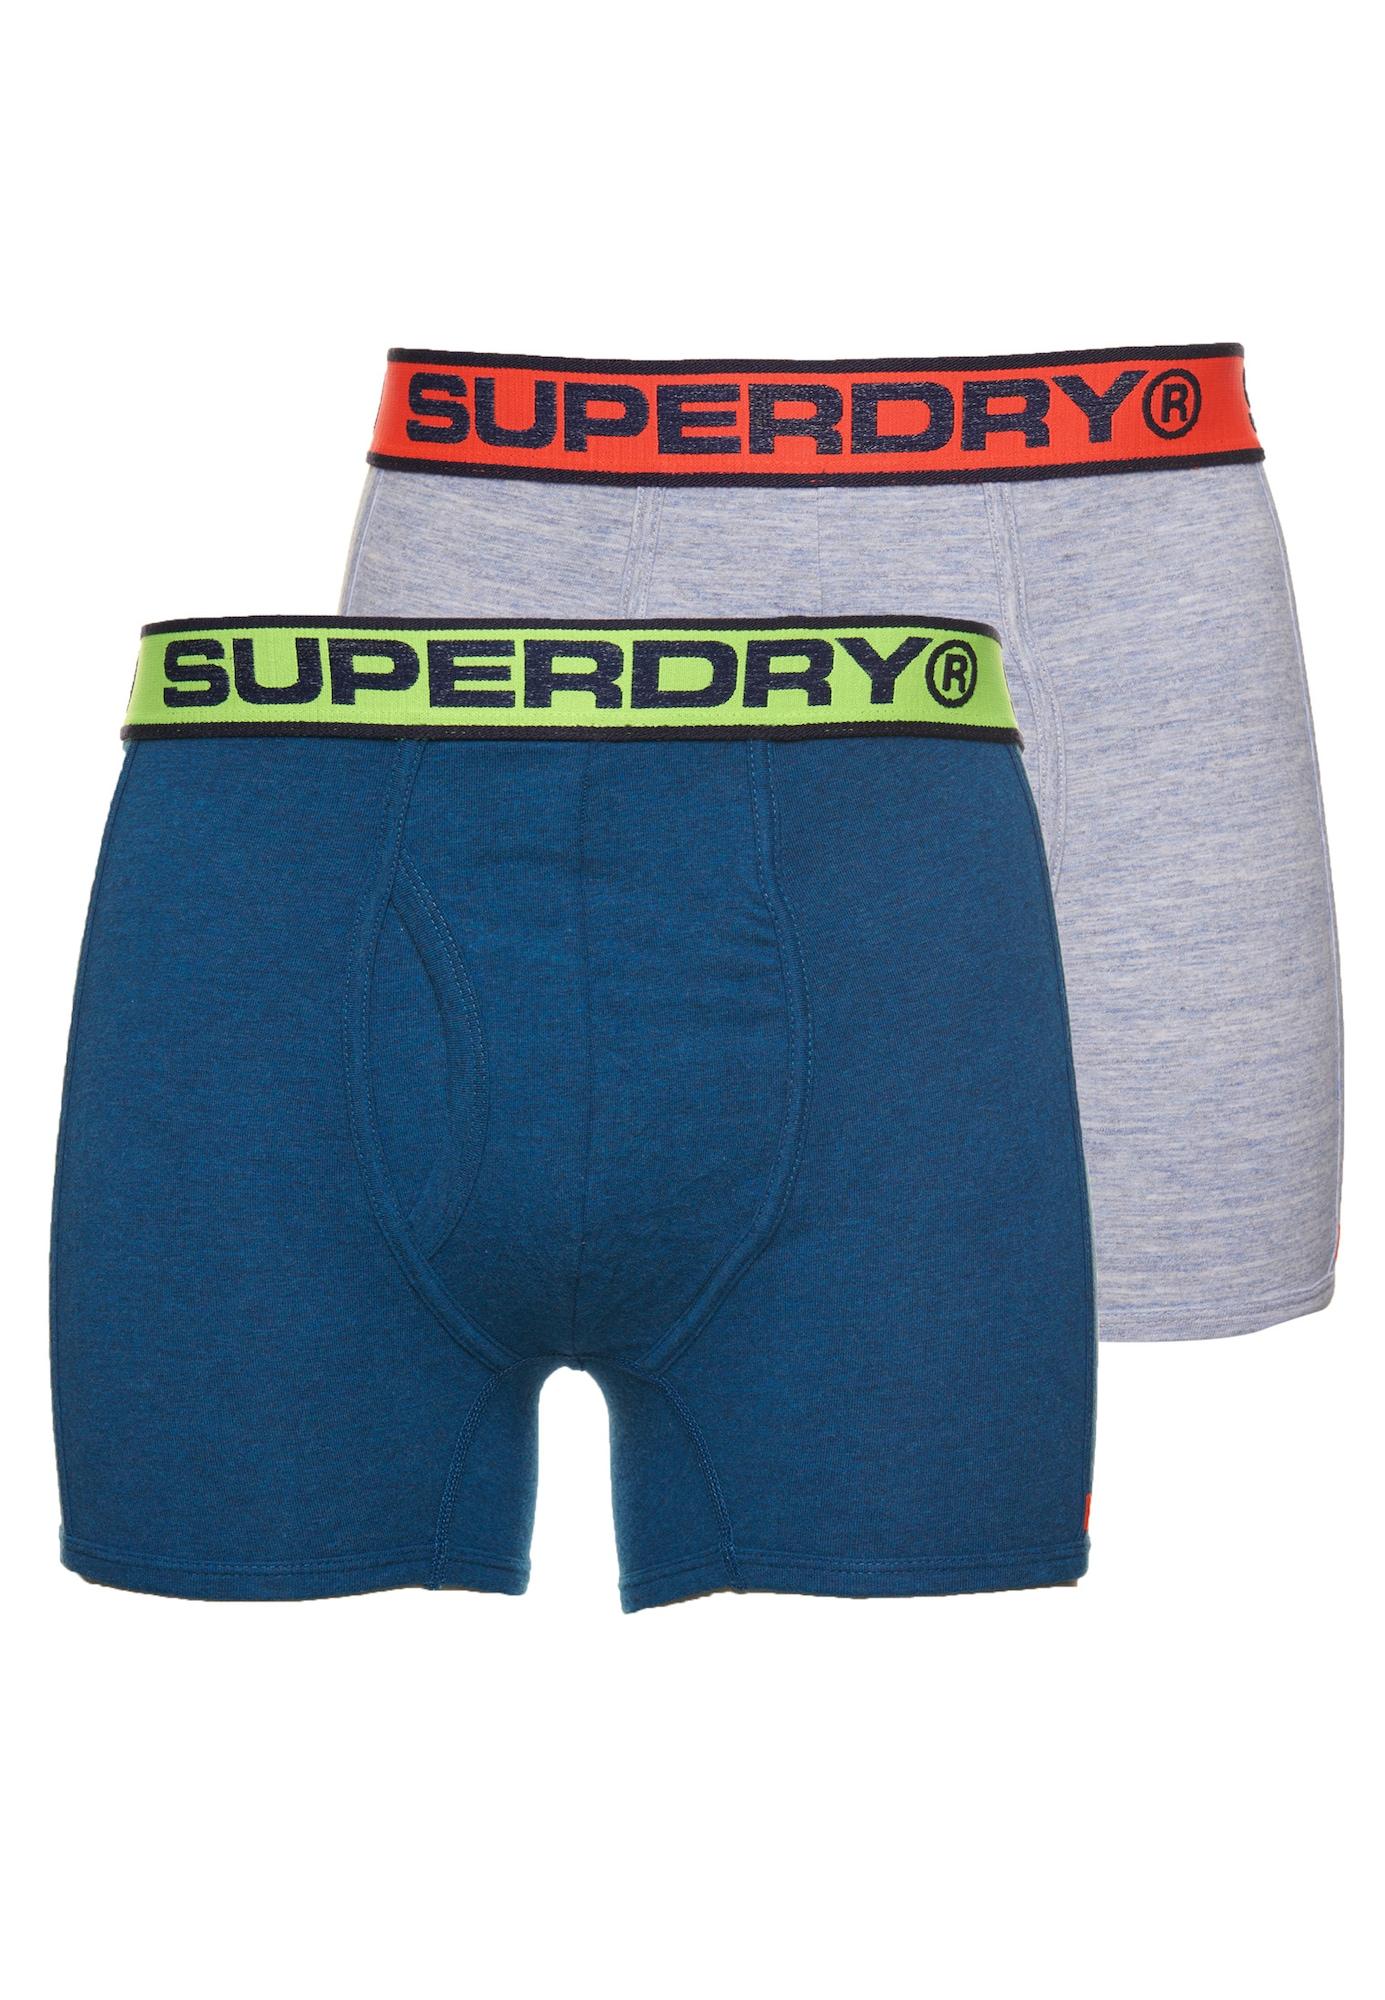 Superdry Boxer trumpikės pilka / mėlyna / raudona / geltona